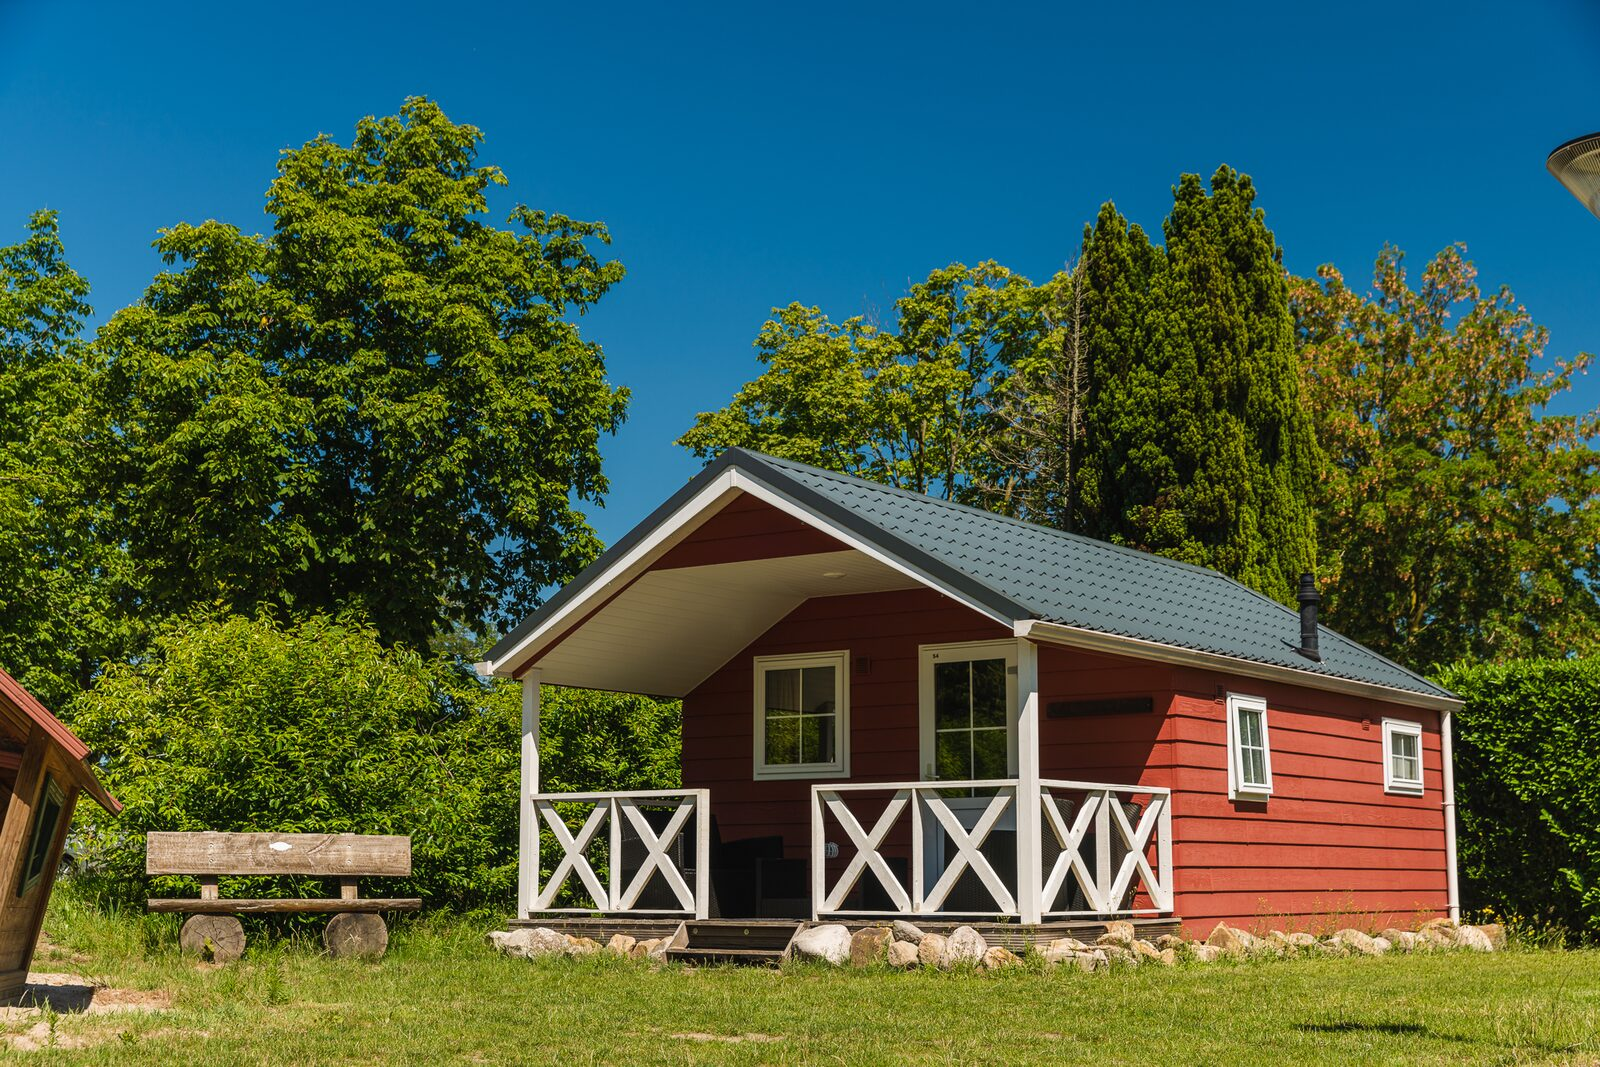 Scandinavian lodges